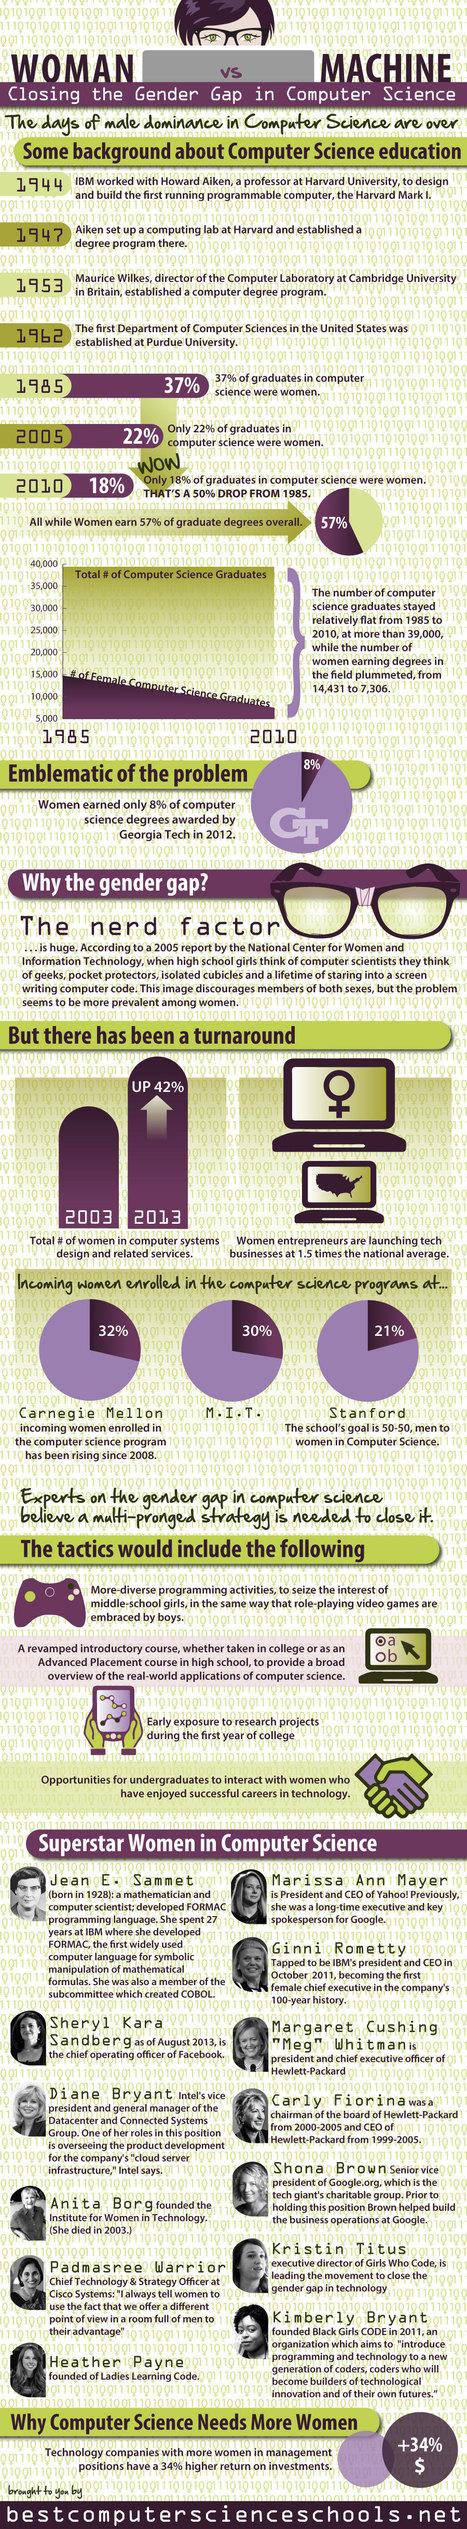 Closing The Gender Gap In Computer Science | Educational Apps & Tools | Scoop.it